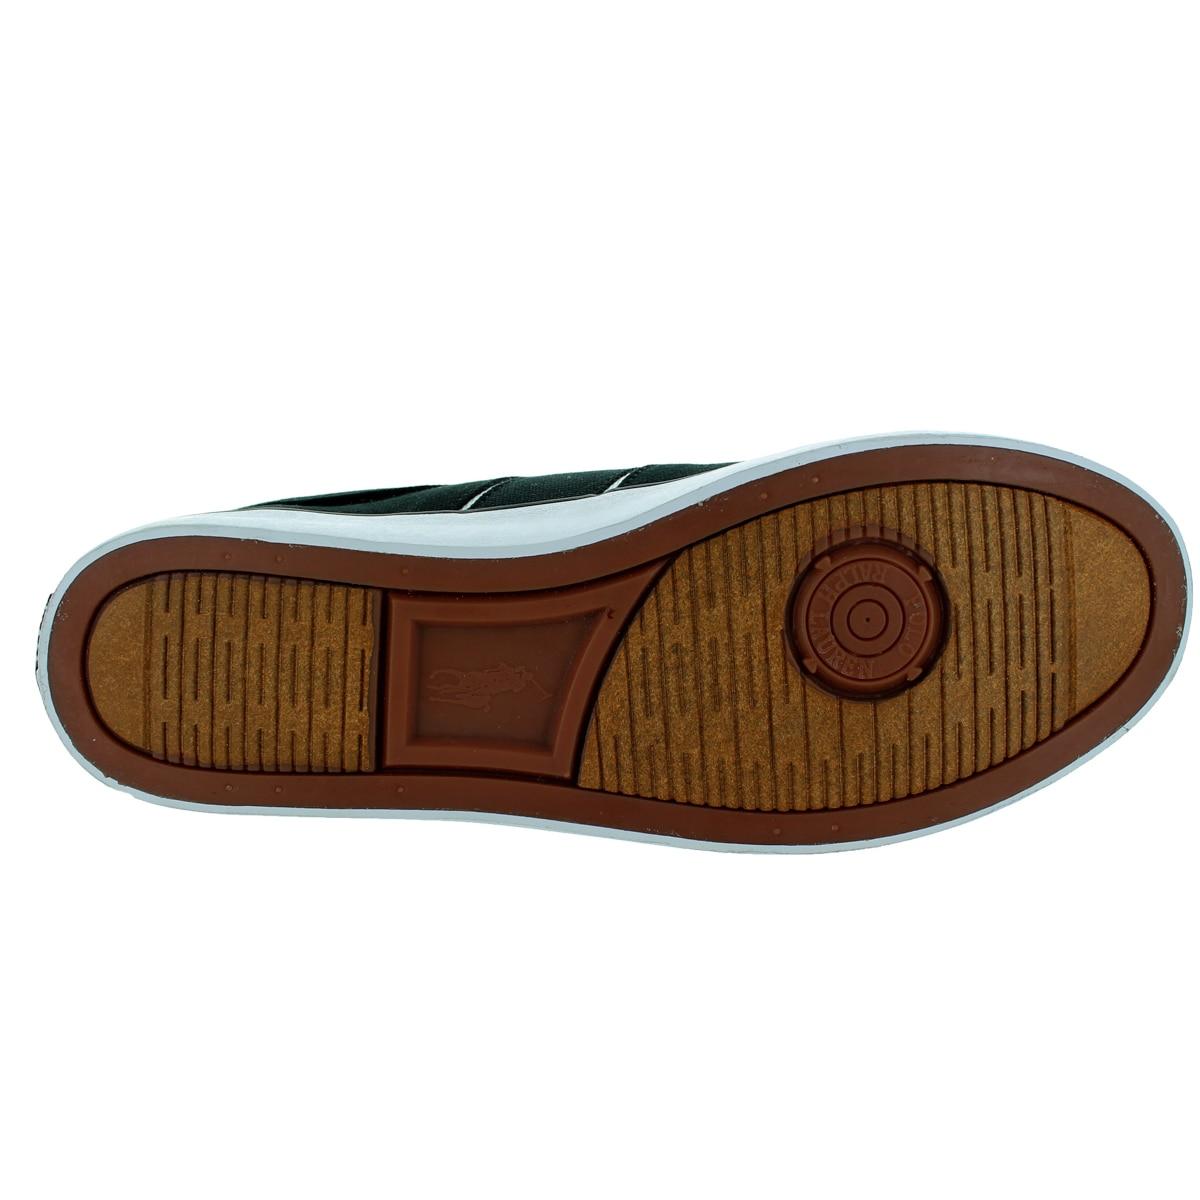 Polo Lauren Shoe Ralph Bolingbrook Casual Men's Blackwhite XiPkuZO